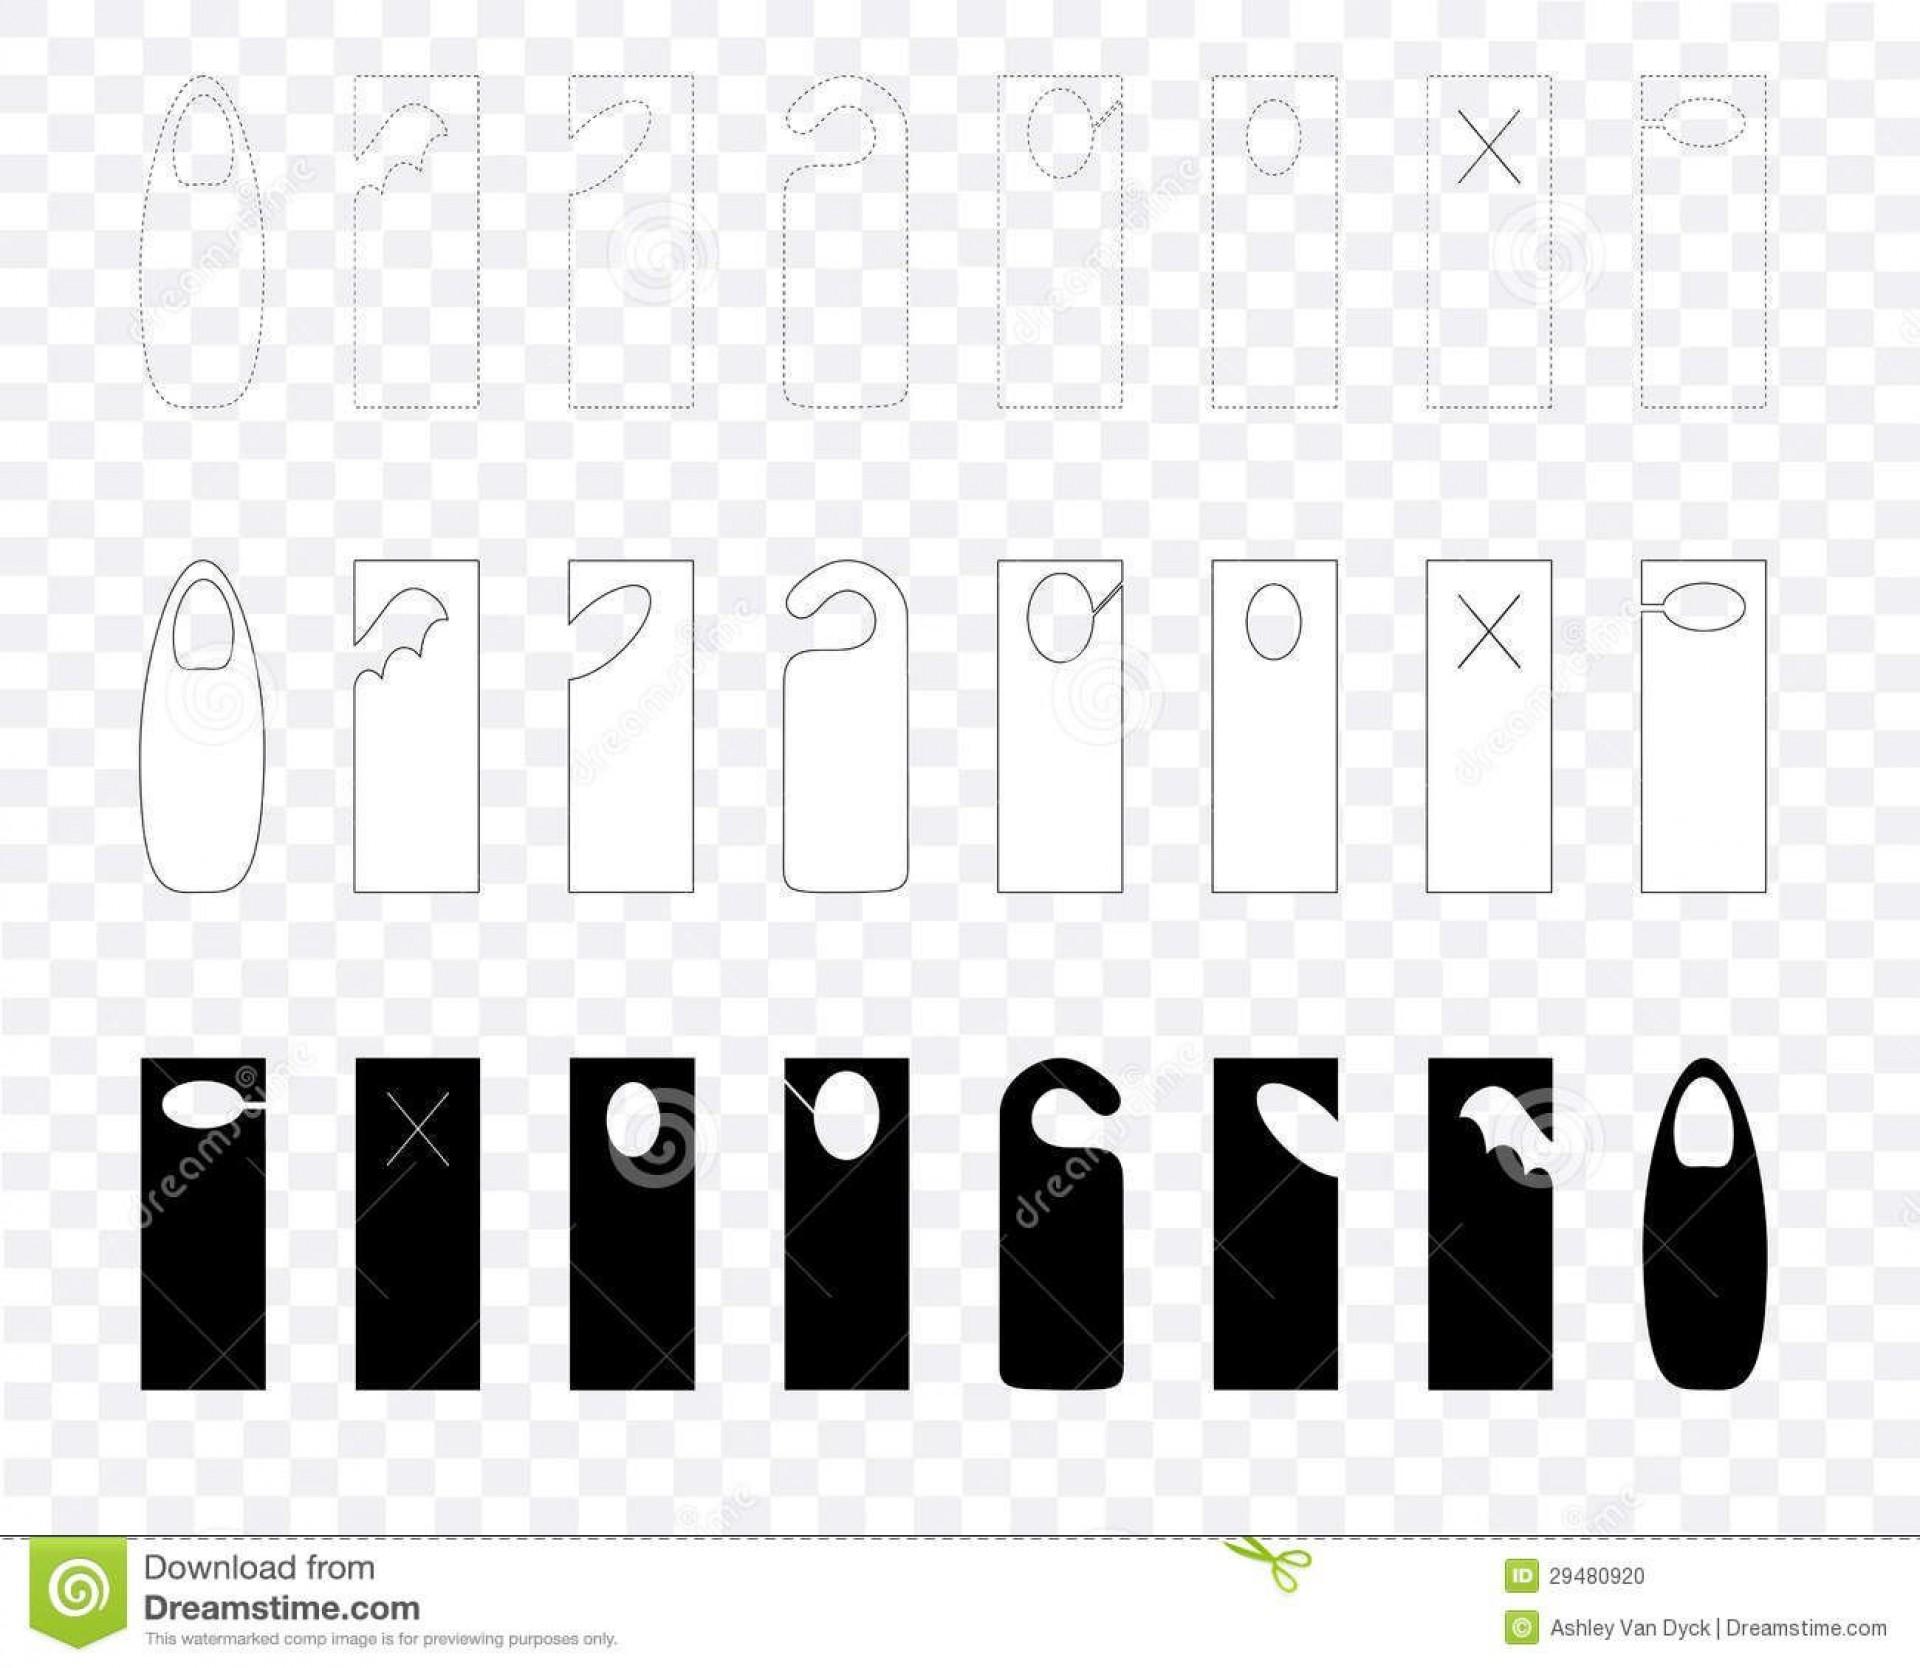 003 Fascinating Blank Door Hanger Template Highest Clarity  Free Printable Microsoft Word1920